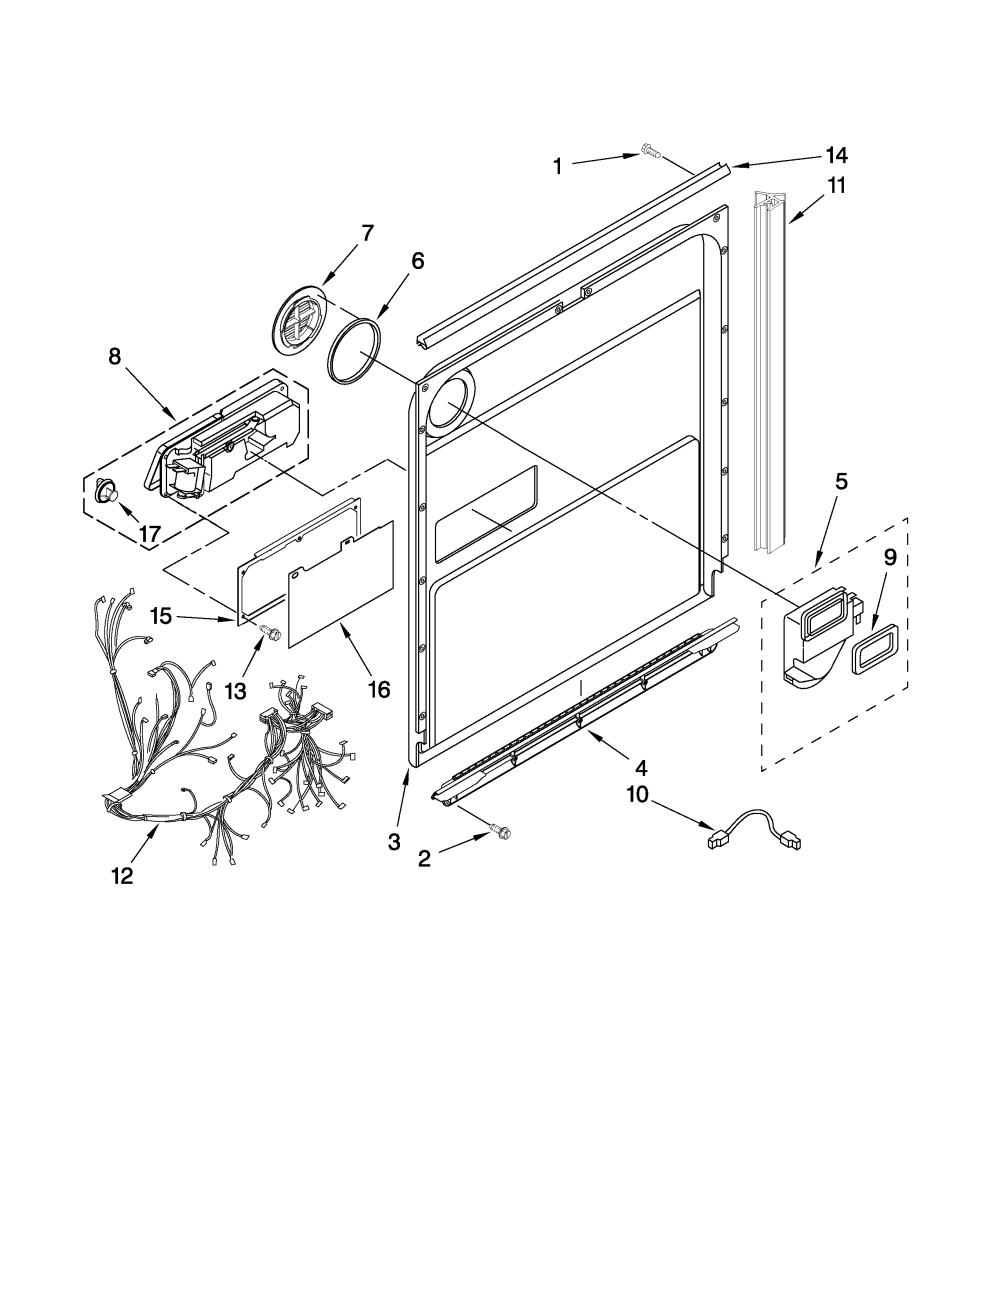 medium resolution of kitchenaid model kuds30ivwh0 dishwasher genuine parts rh searspartsdirect com kitchenaid dishwasher wiring harness diagram kitchenaid dishwasher